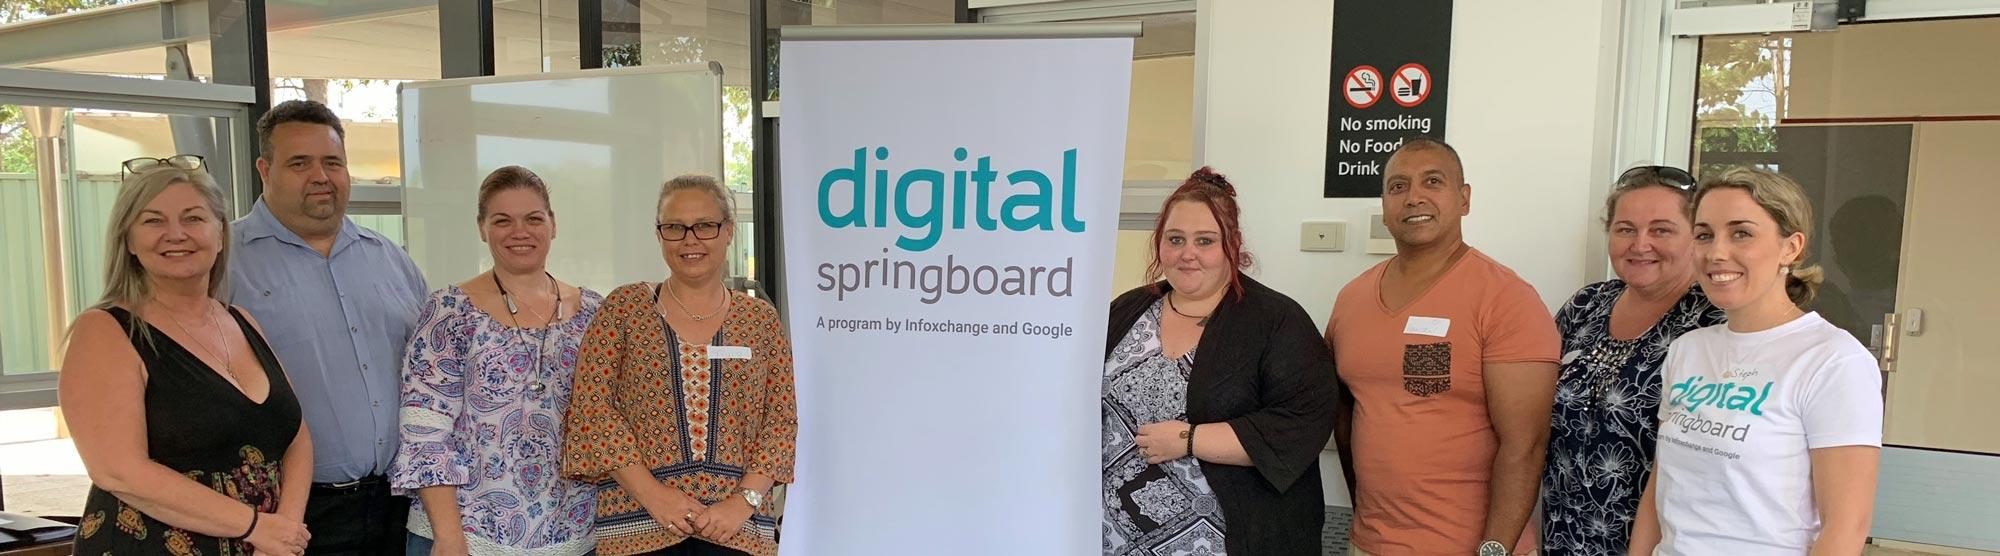 Digital Springboard